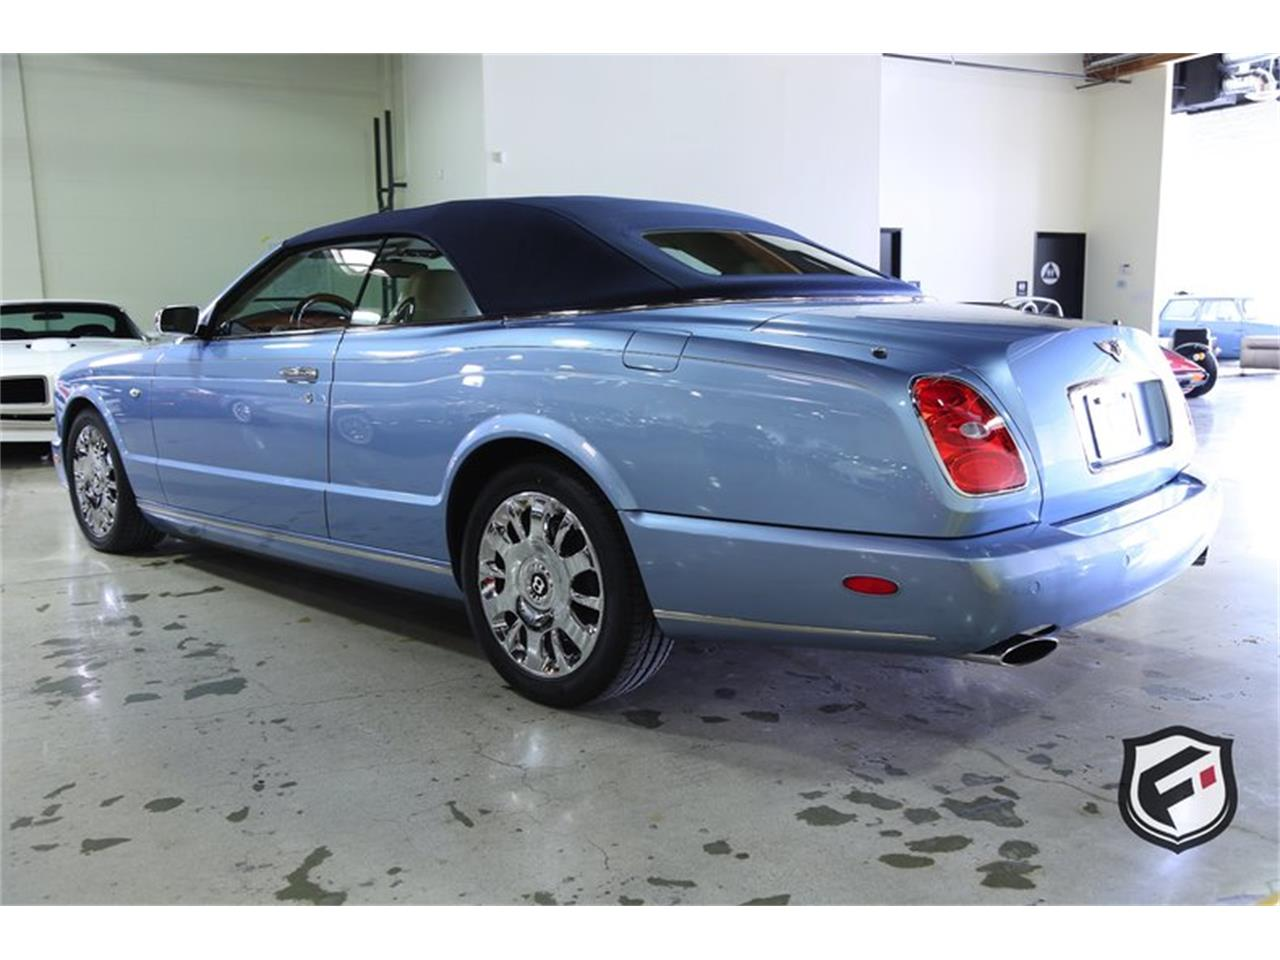 2008 Bentley Azure for Sale | ClassicCars.com | CC-963686